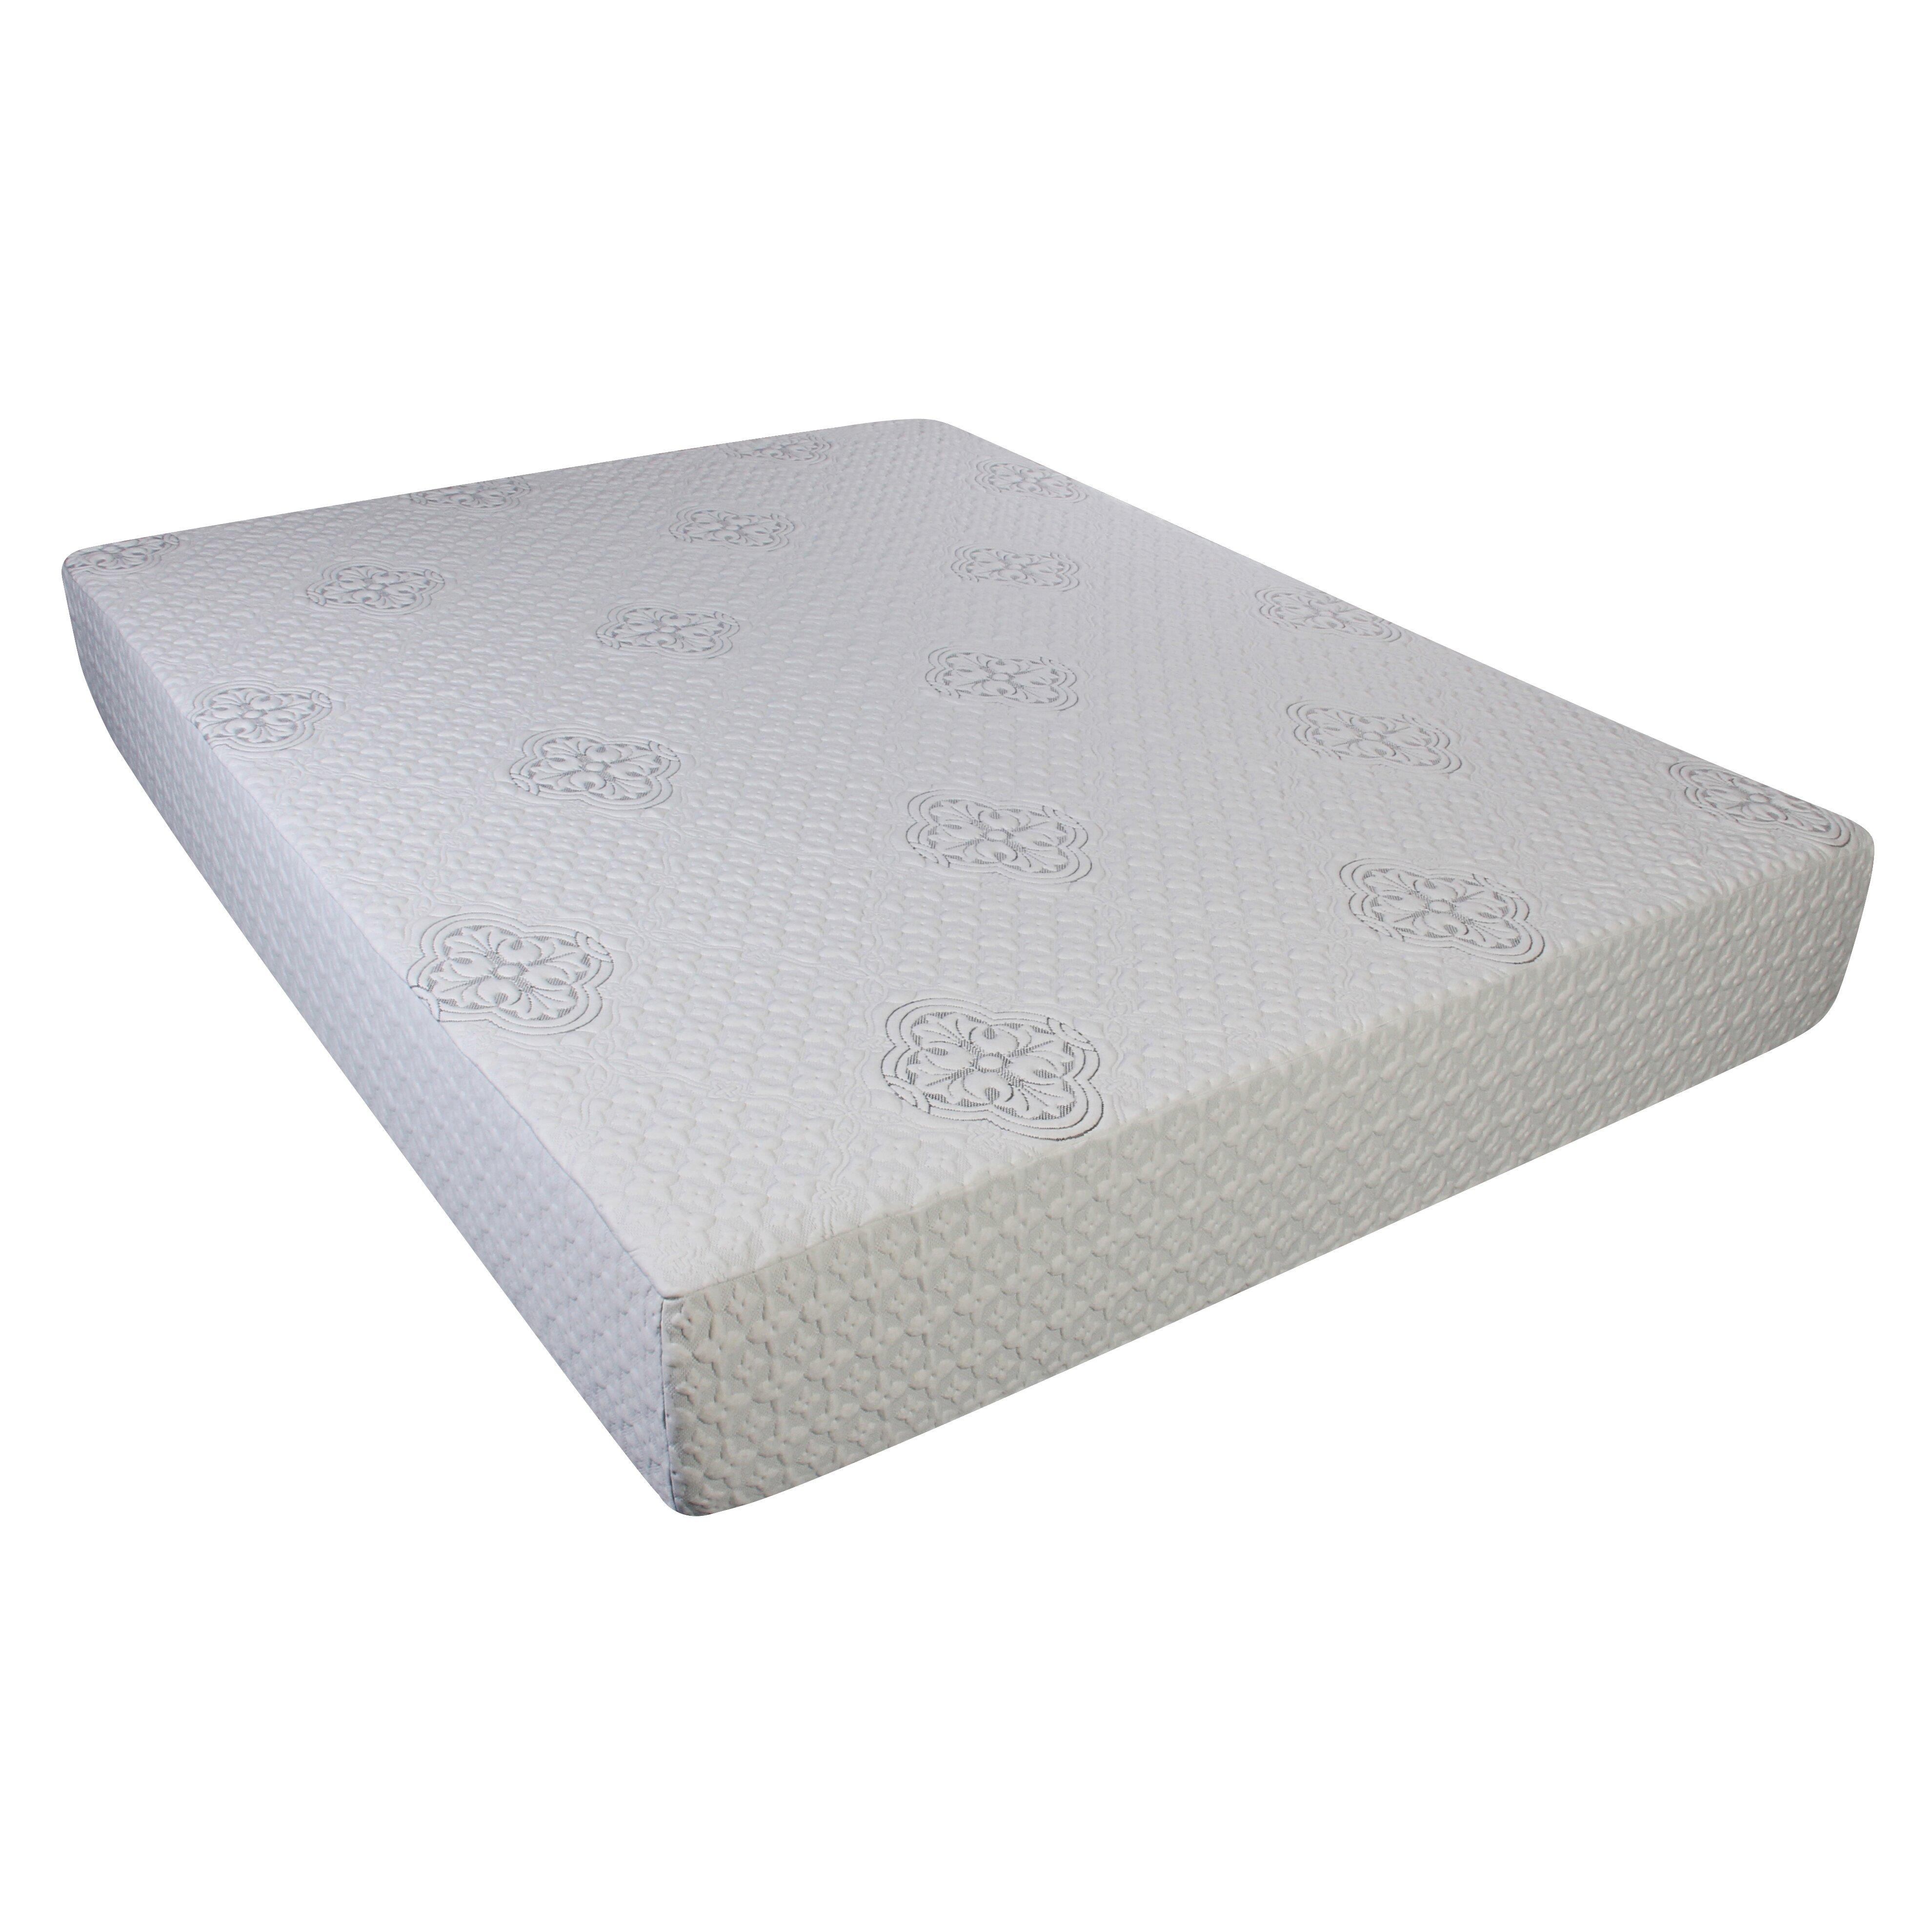 Shea 10 Inch Memory Foam Mattress Sleep Innovations